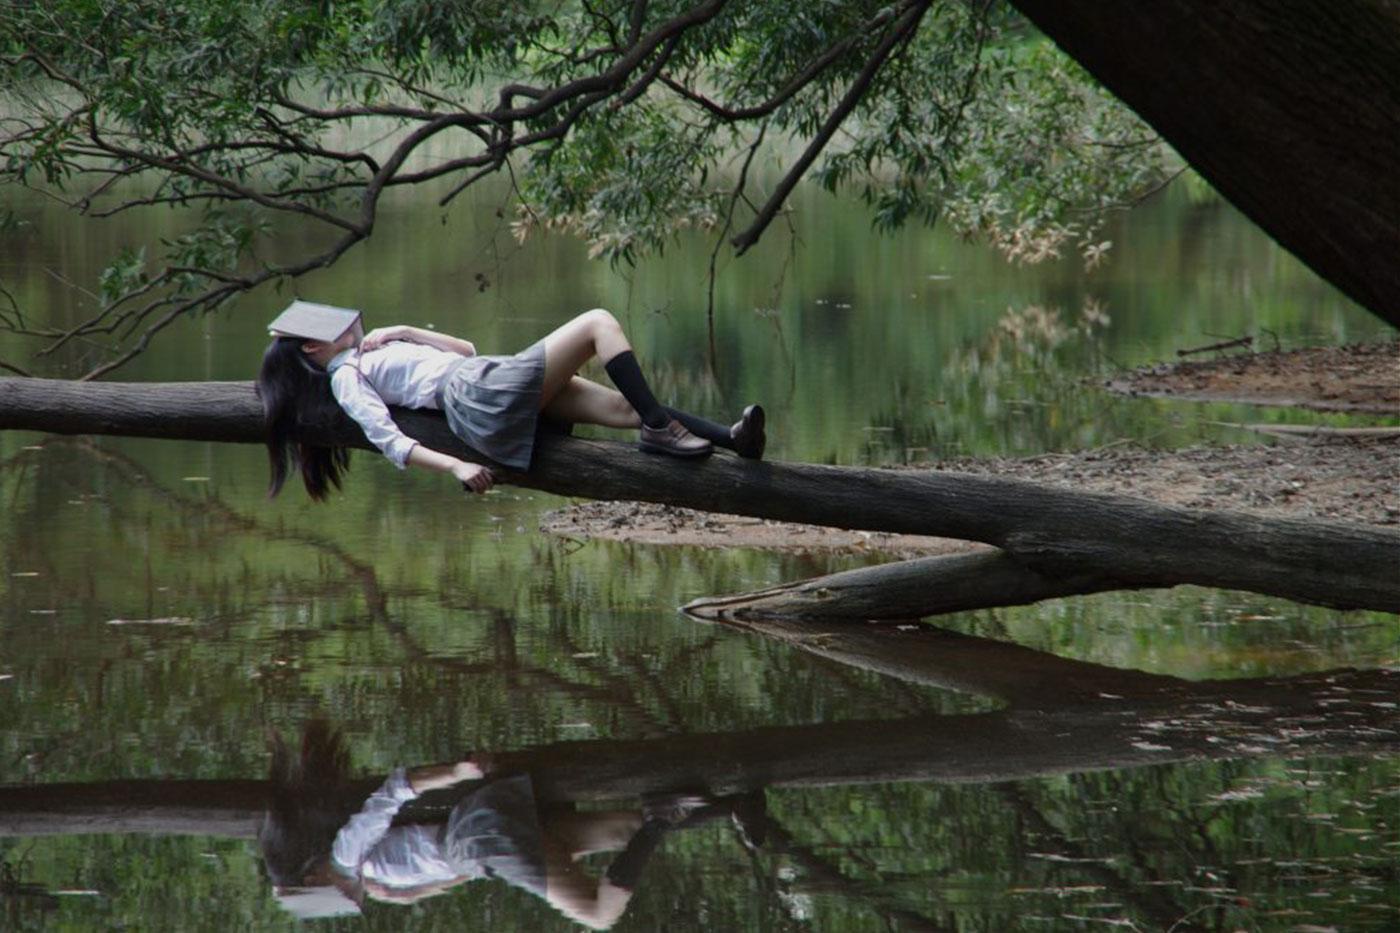 Strange but effective therapies for sleep!